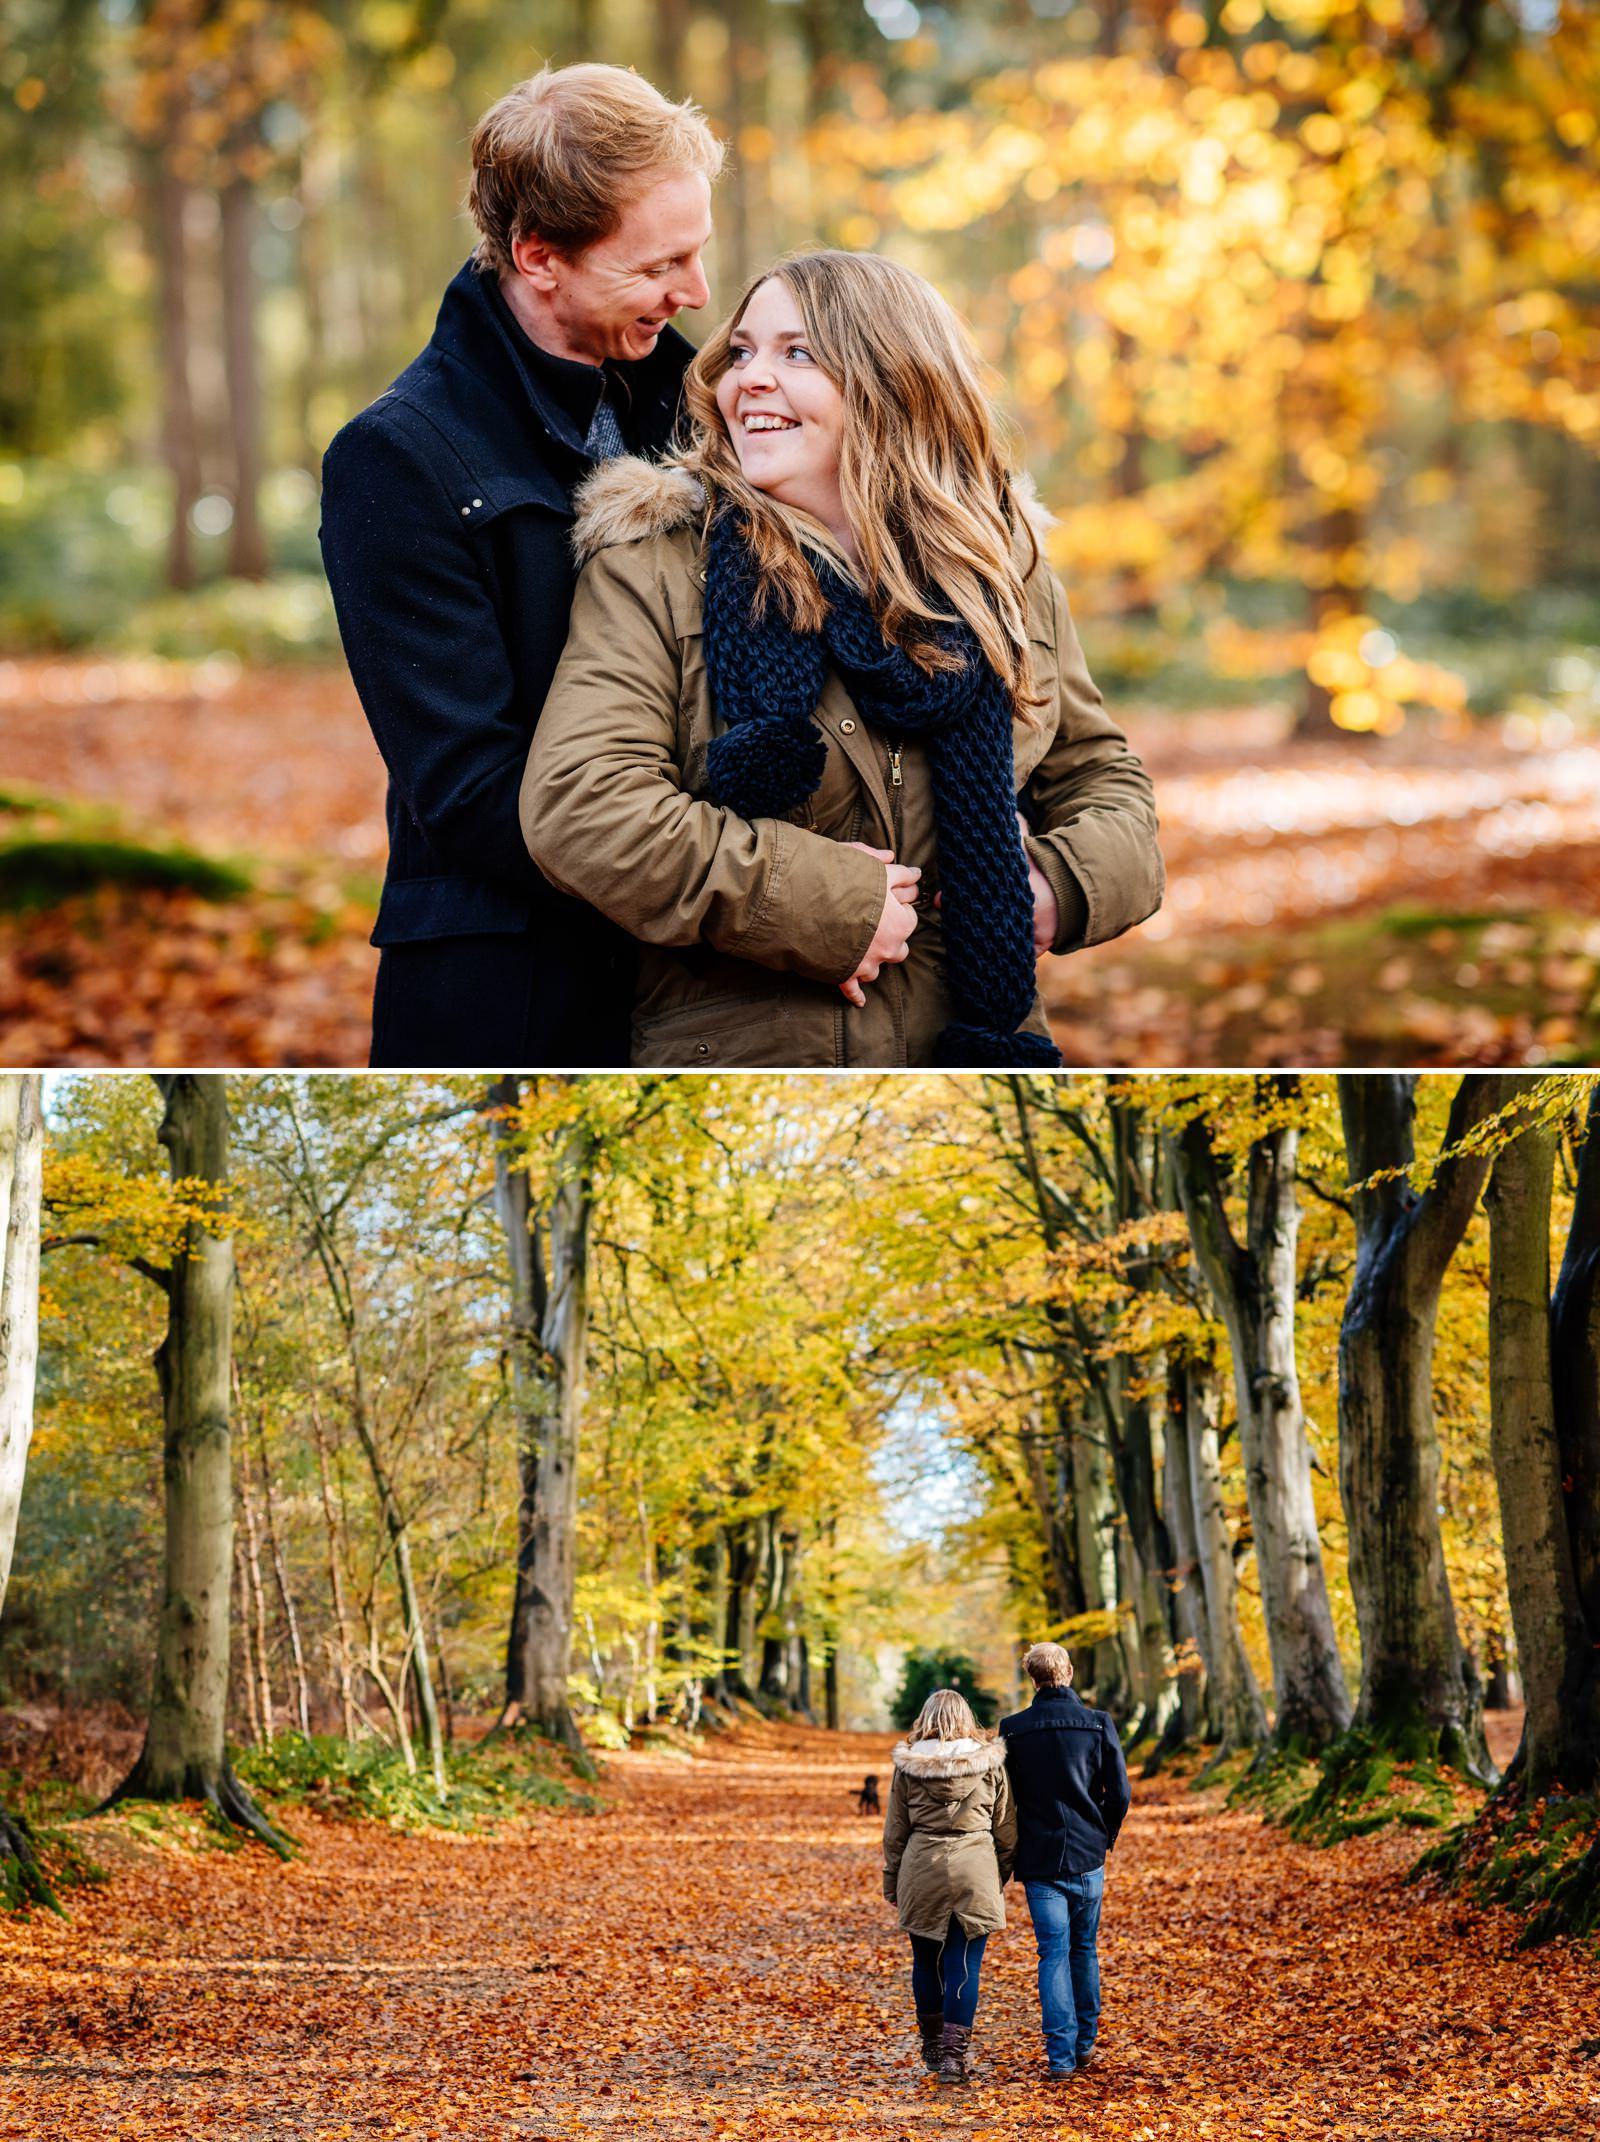 Nicola & Dan - Harlestone Firs Pre-Wedding Shoot_0006